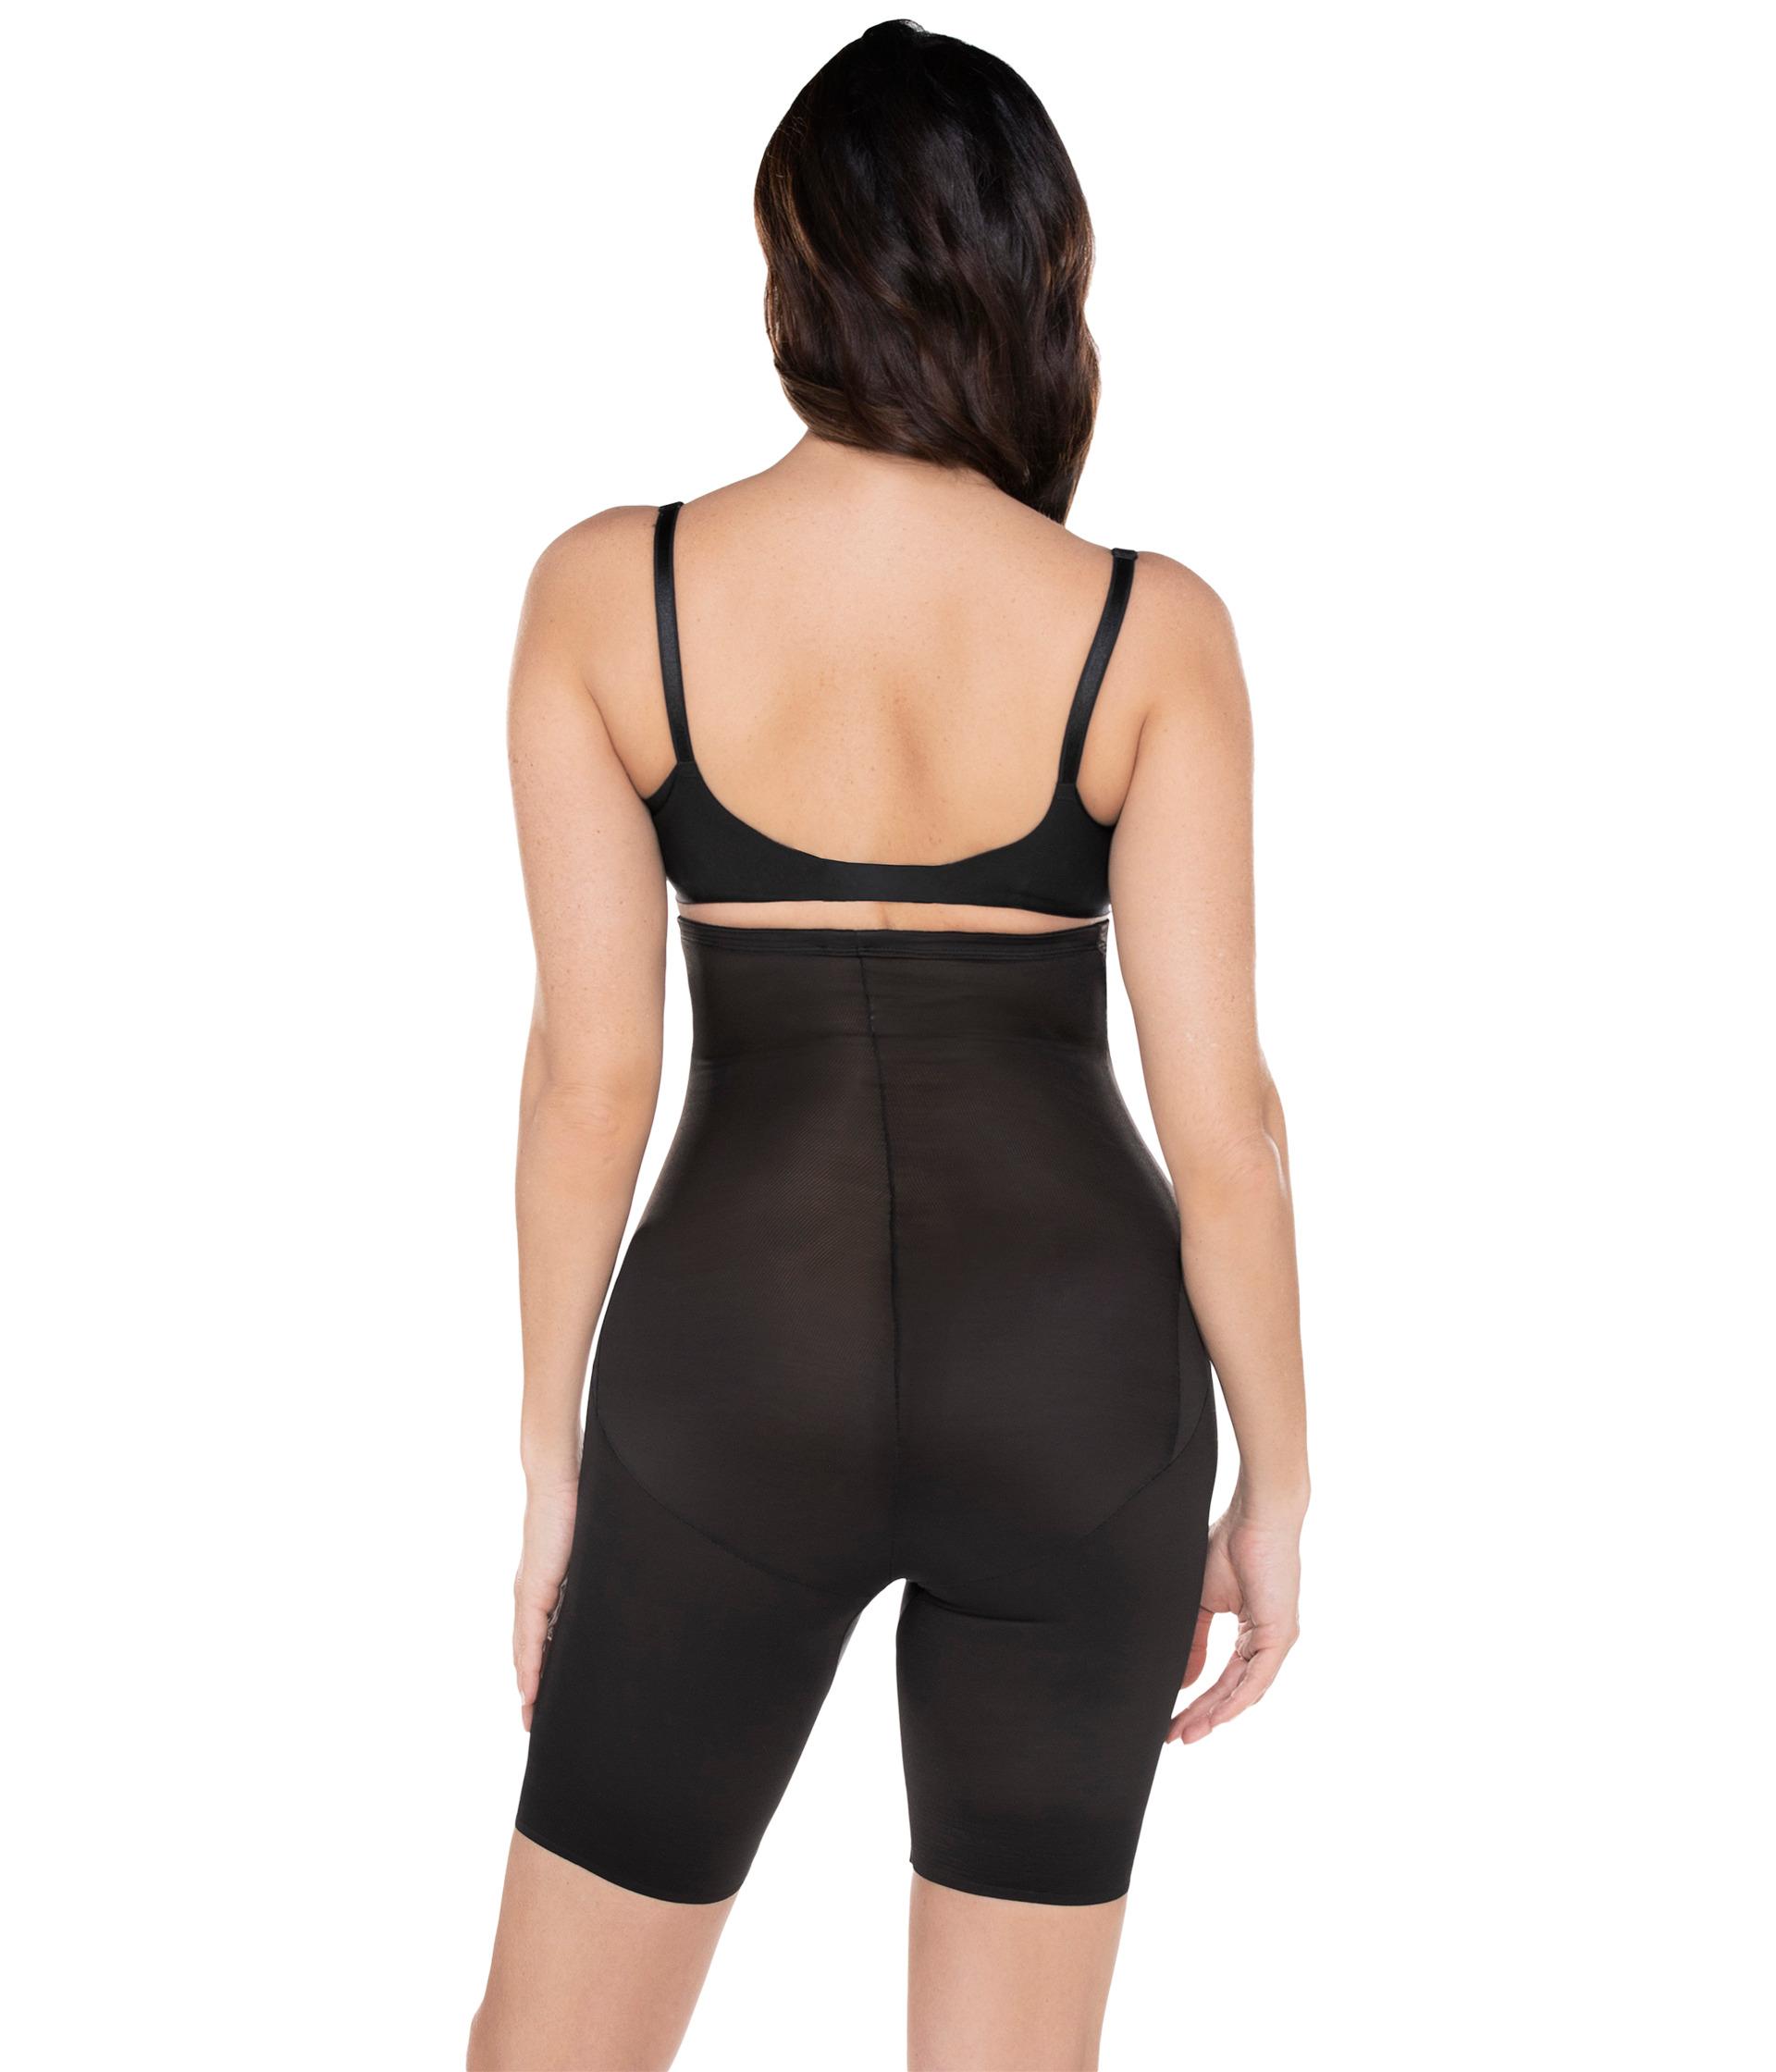 c744e13984aa51 Long Leg Shaper, Shapewear, including Simone Perele Top Model High Waist  Shaper, Body Wrap Smooth Catwalk High-Waist Long-Leg Bodysuit, ...